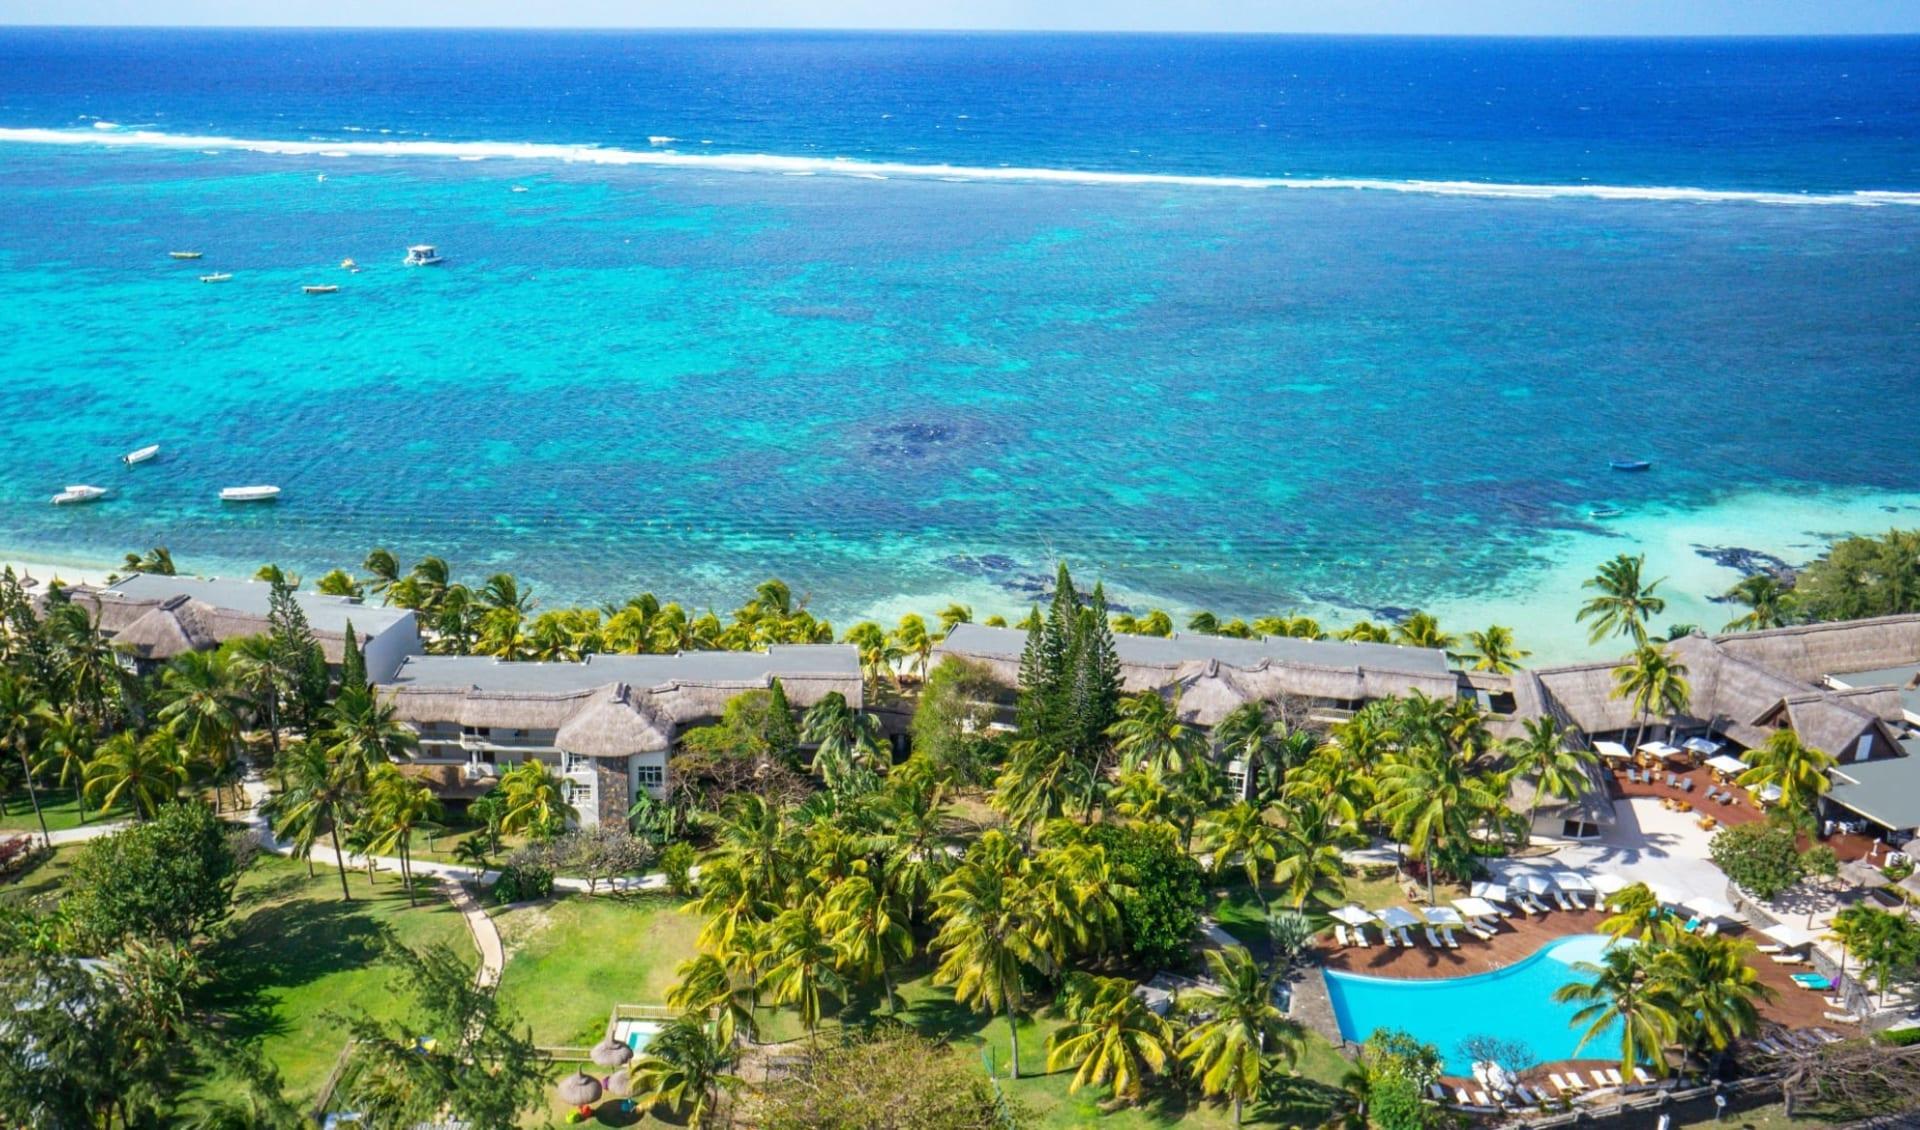 Solana Beach Mauritius in Belle Mare: